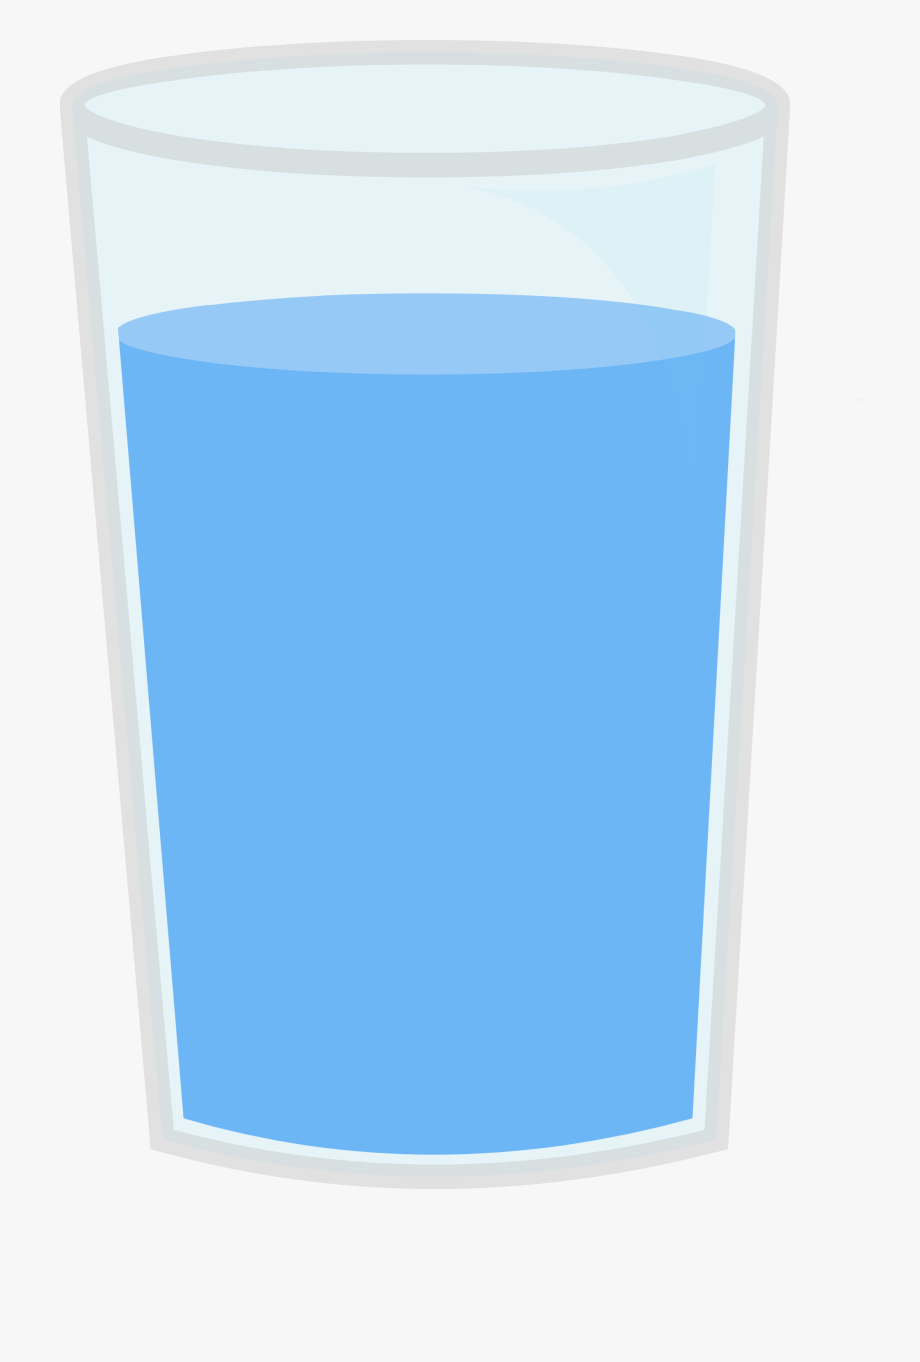 Lake Clipart Body Water.